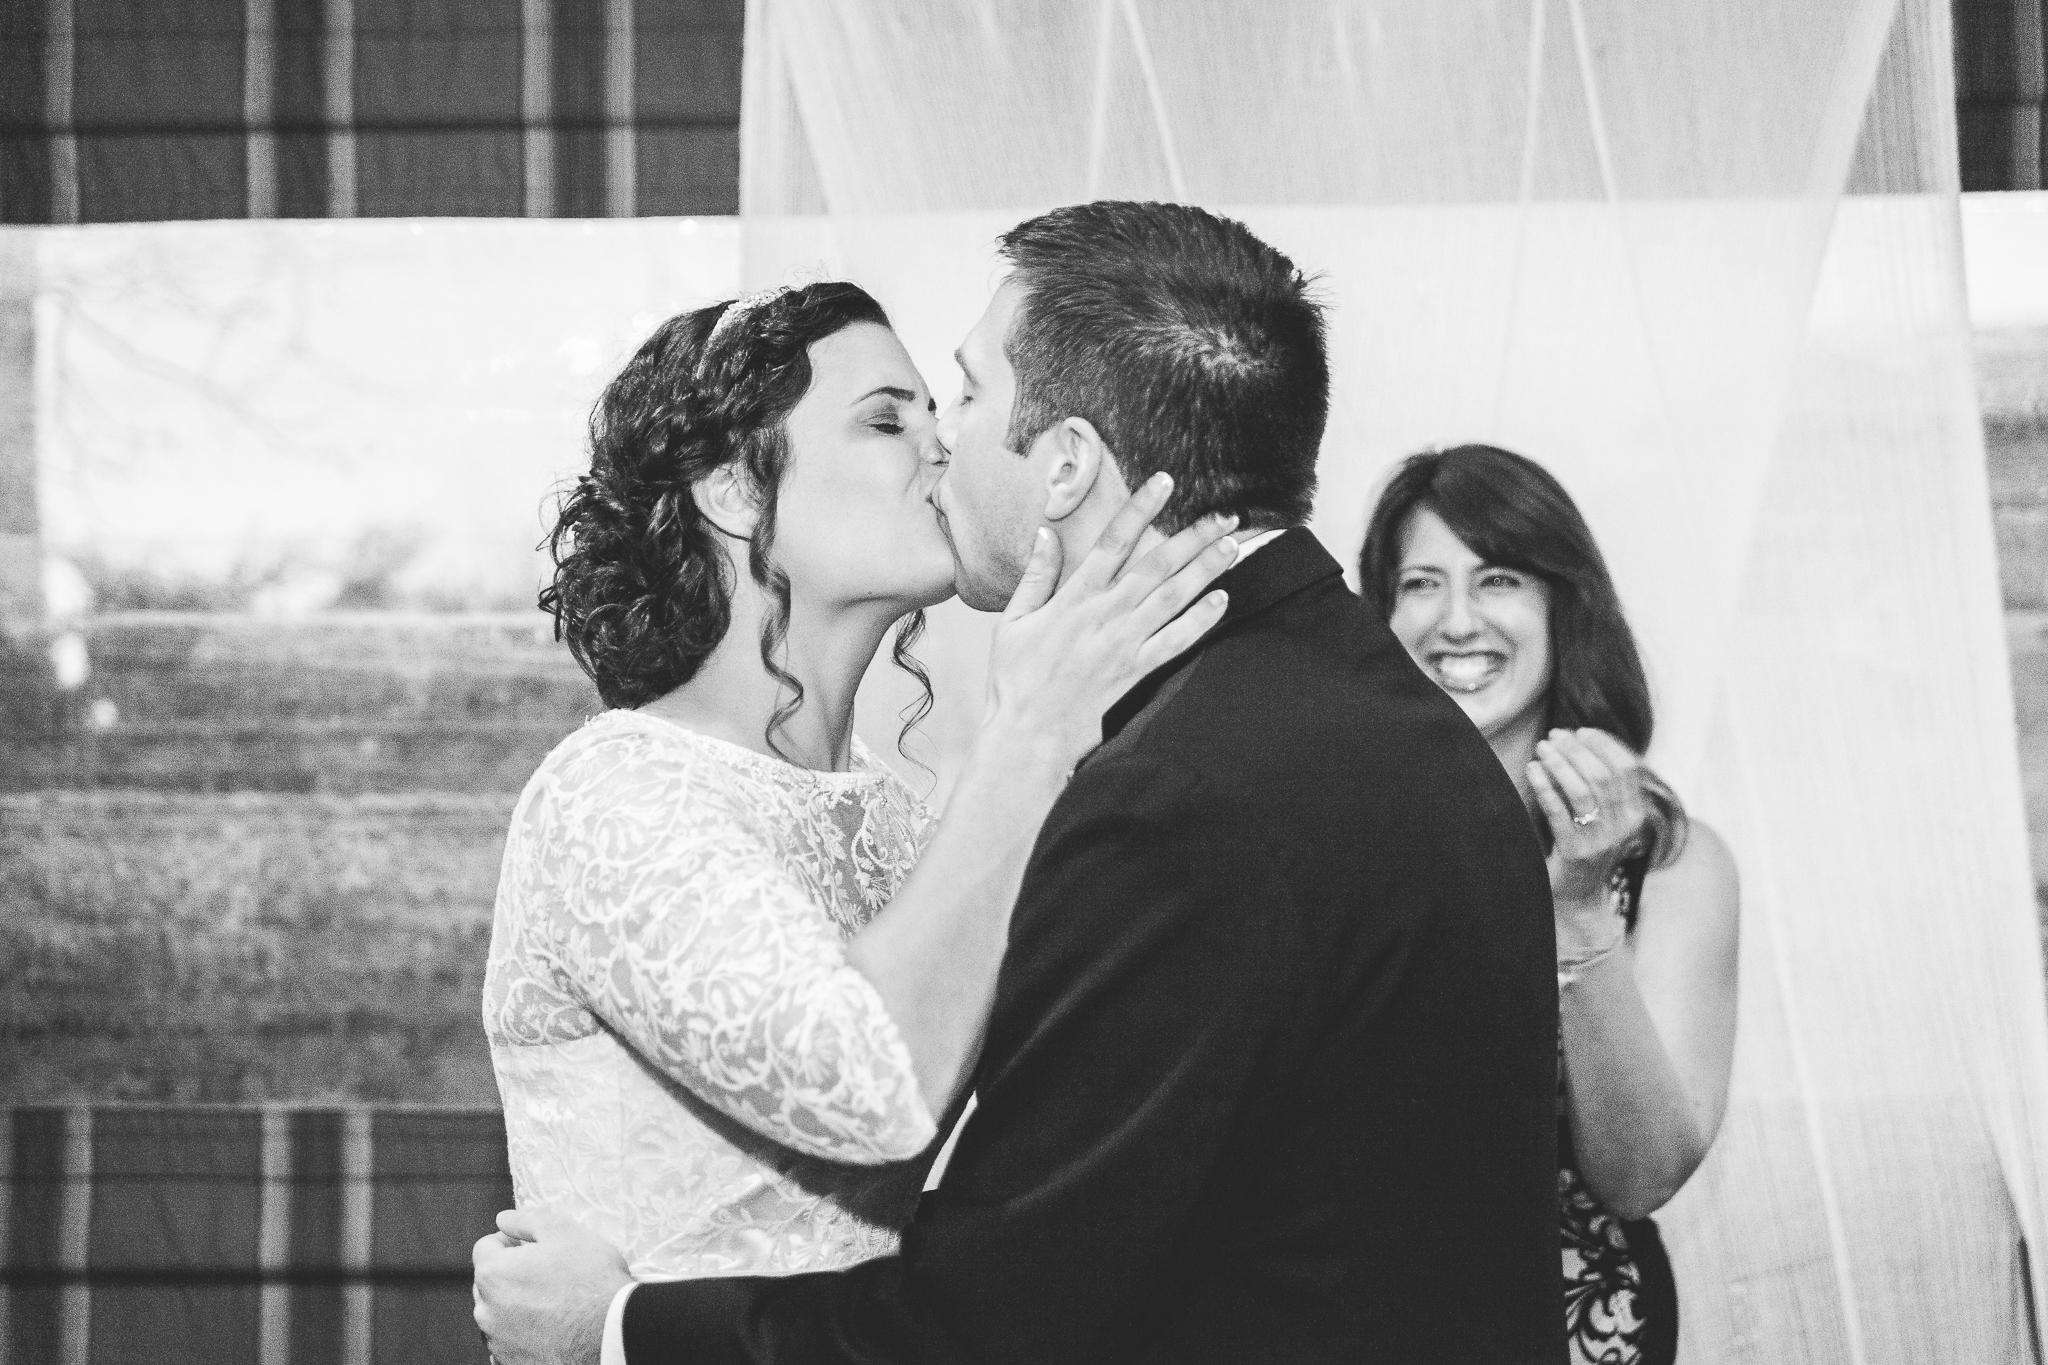 camuglia-whomstudio-chelsea_and_andy-nycphotographer-wedding-brooklyn-buffalo-timberlodge-089-0639.jpg